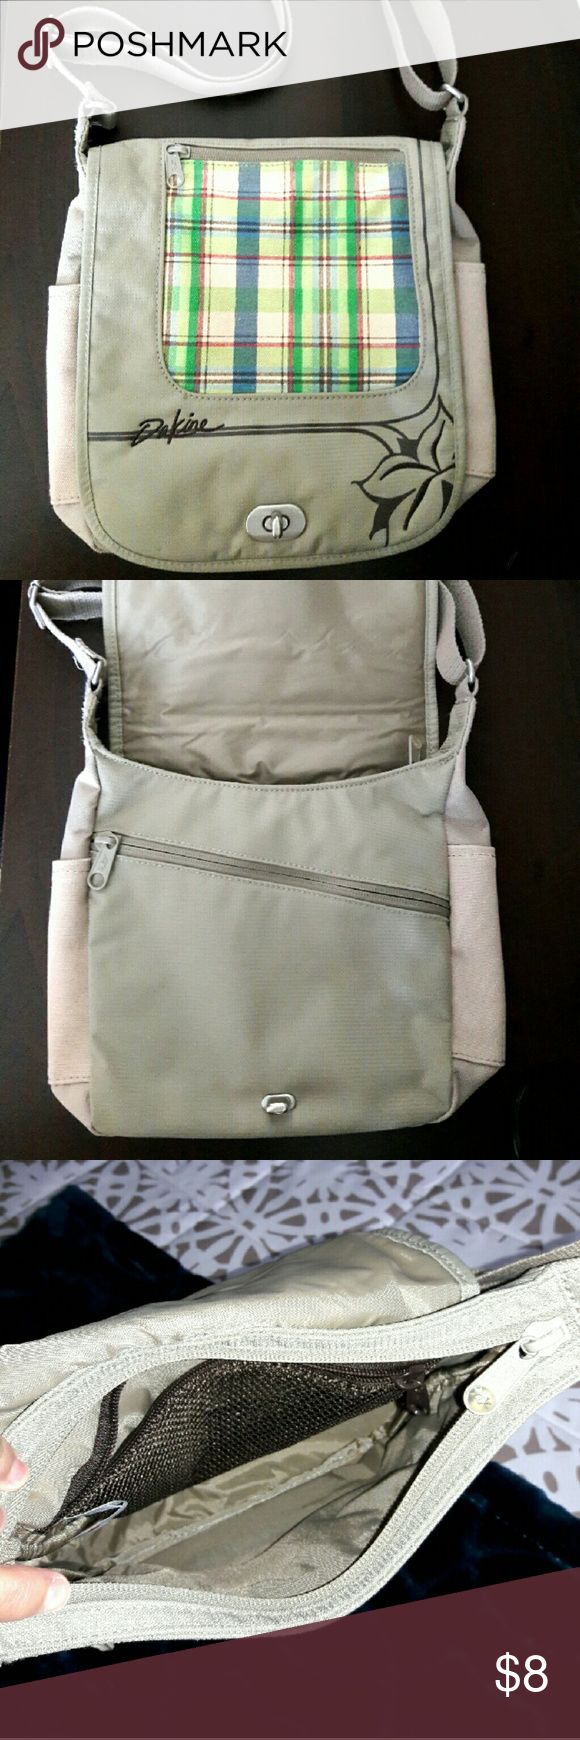 Dakine Vintage Crossbody Cross Body Bag Dakine Vintage Crossbody Cross Body Bag in excellent condition. Dakine Bags Crossbody Bags